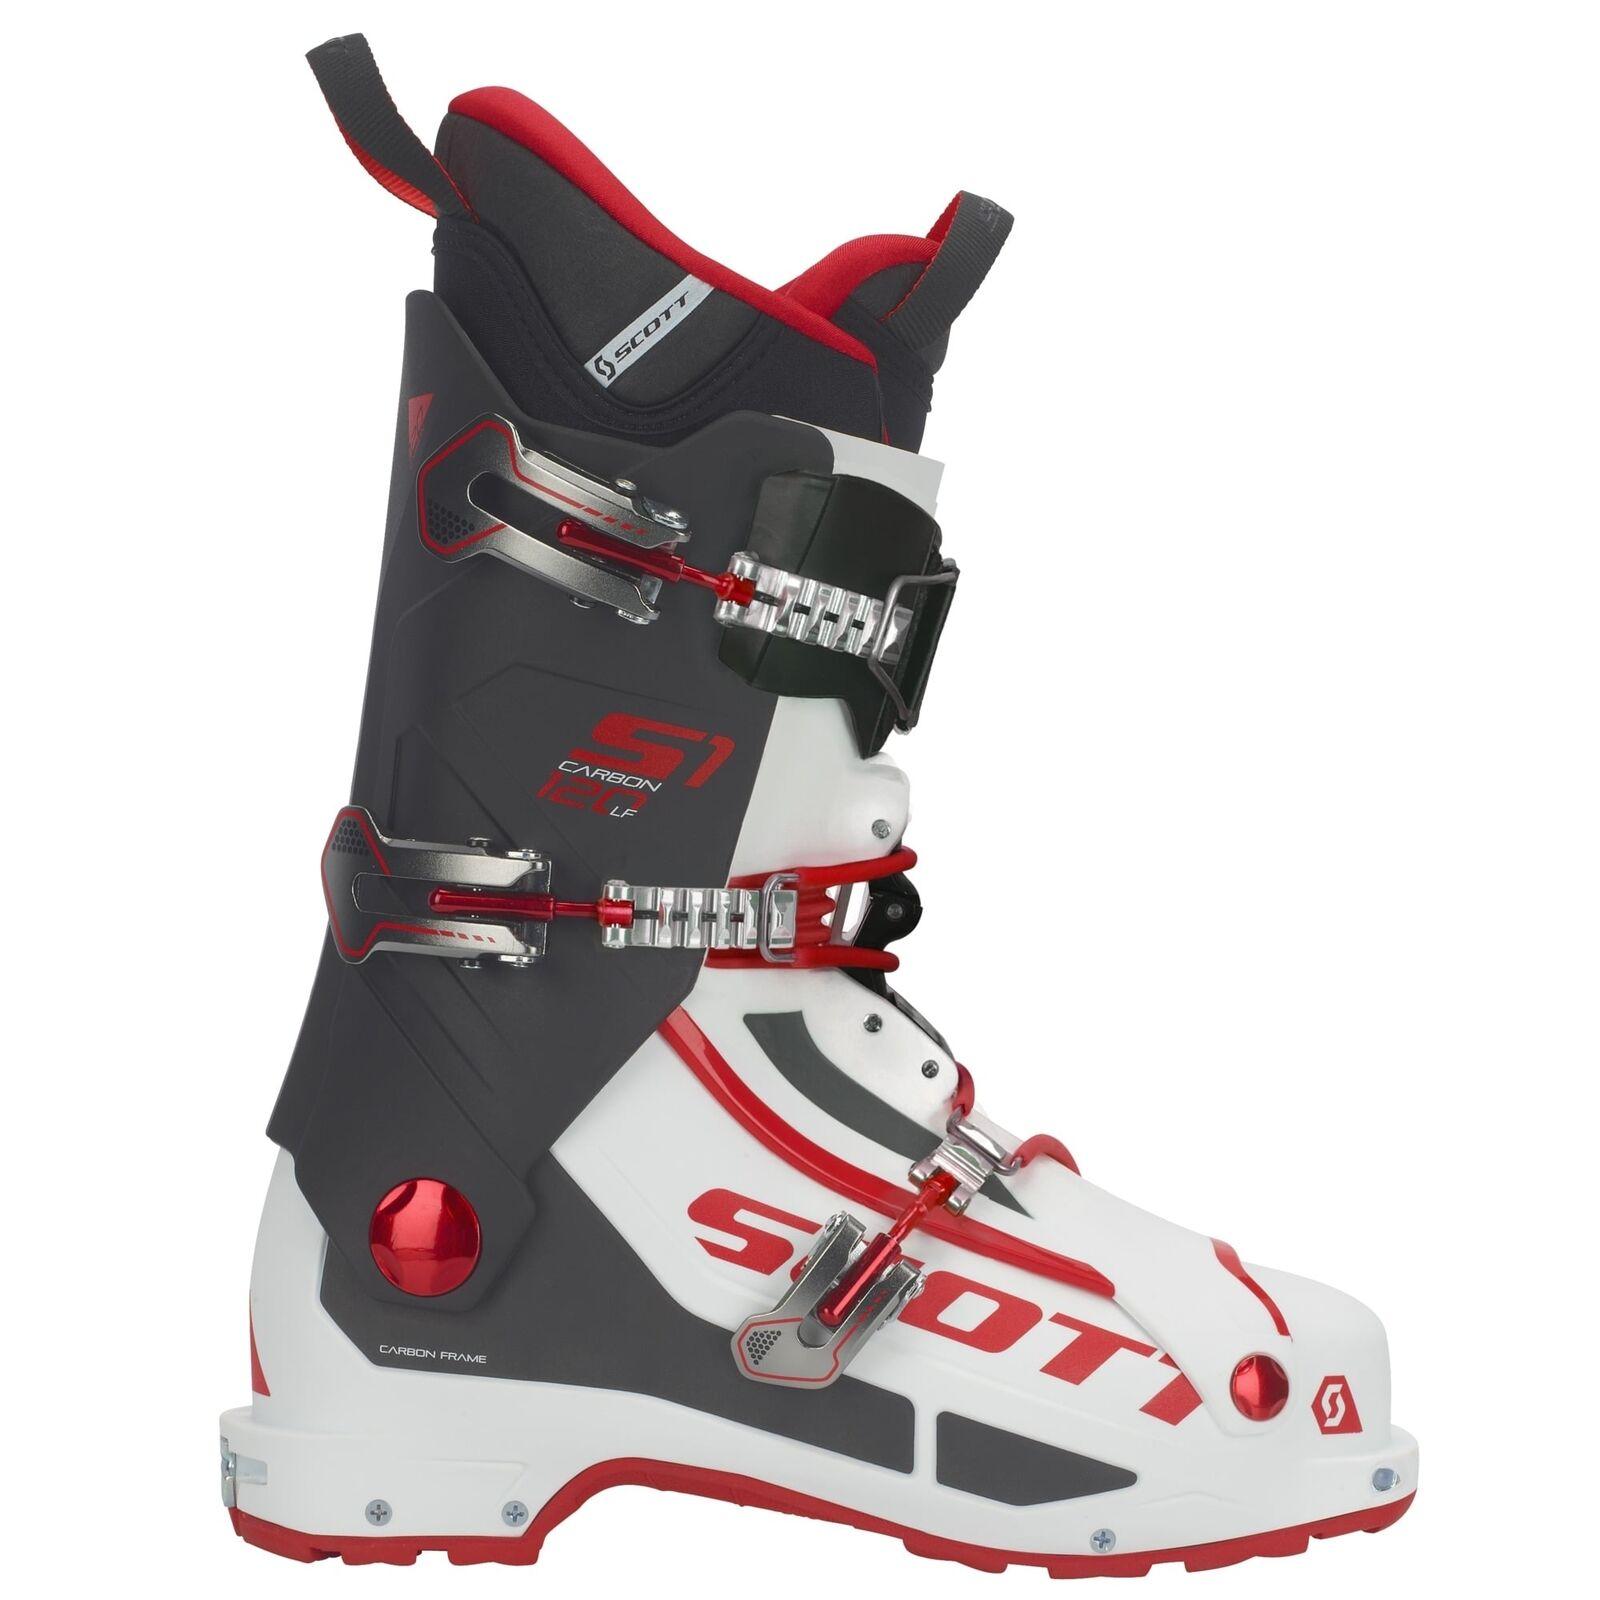 Ski TouRing Scott S1 KoolstofLongfiber